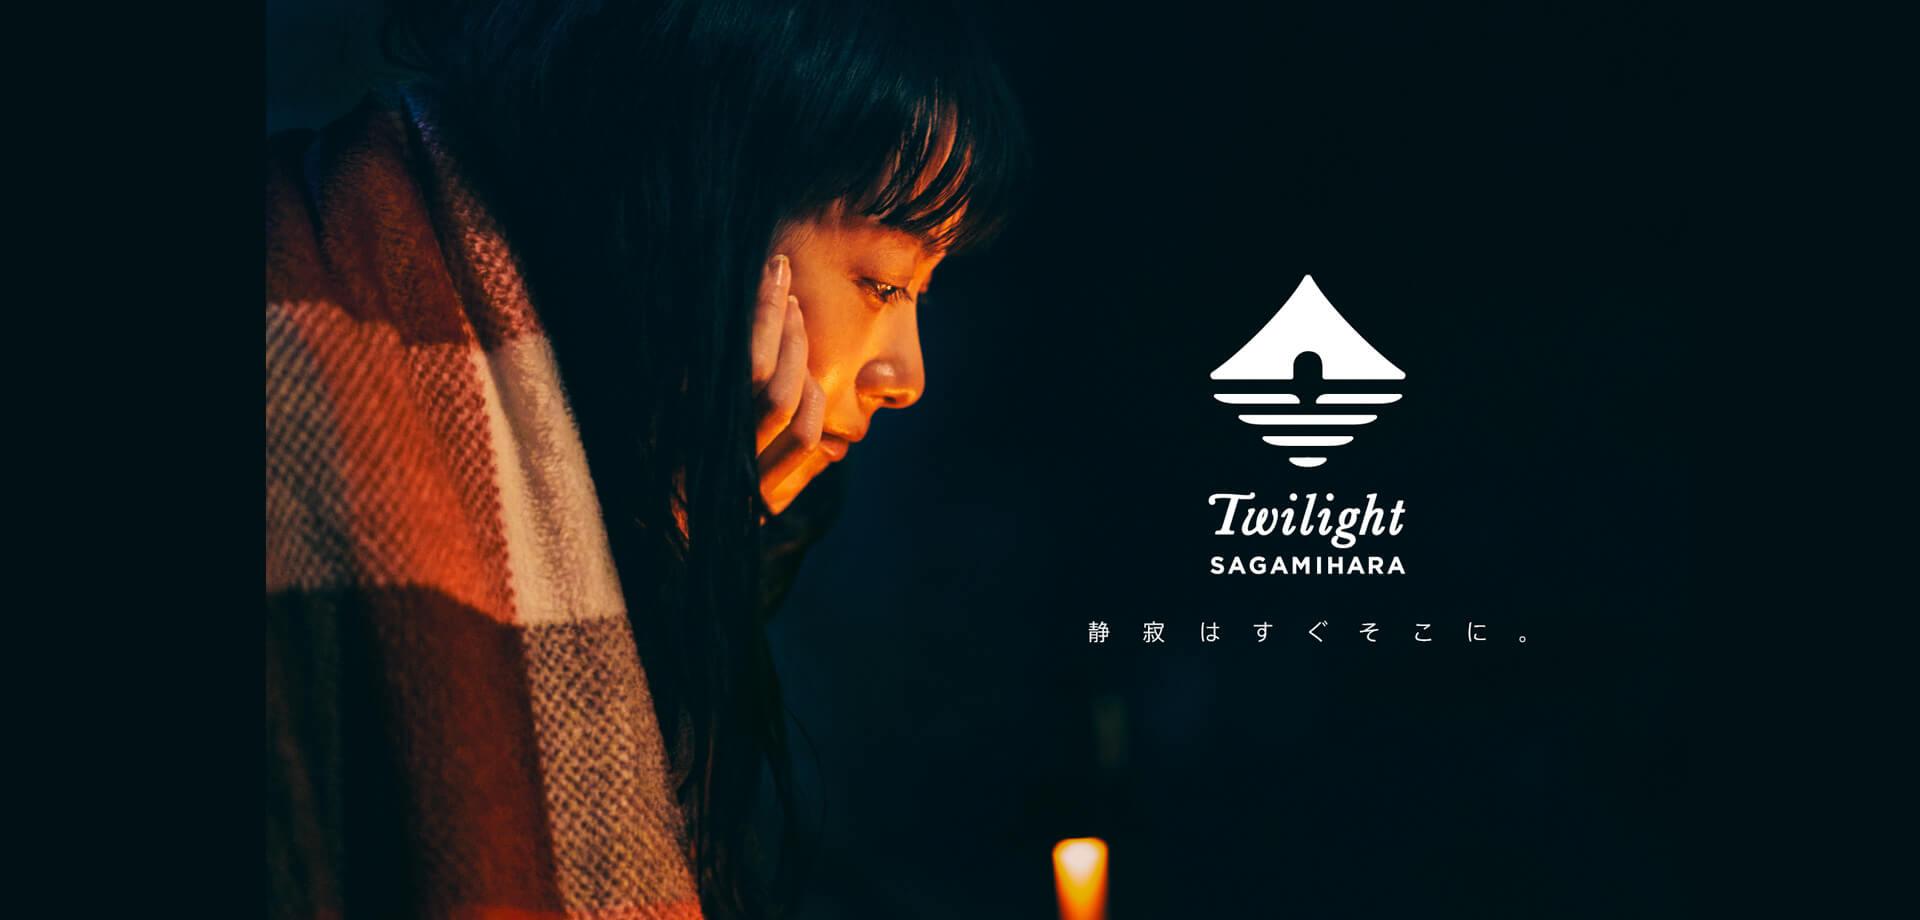 Twilight SAGAMIHARA